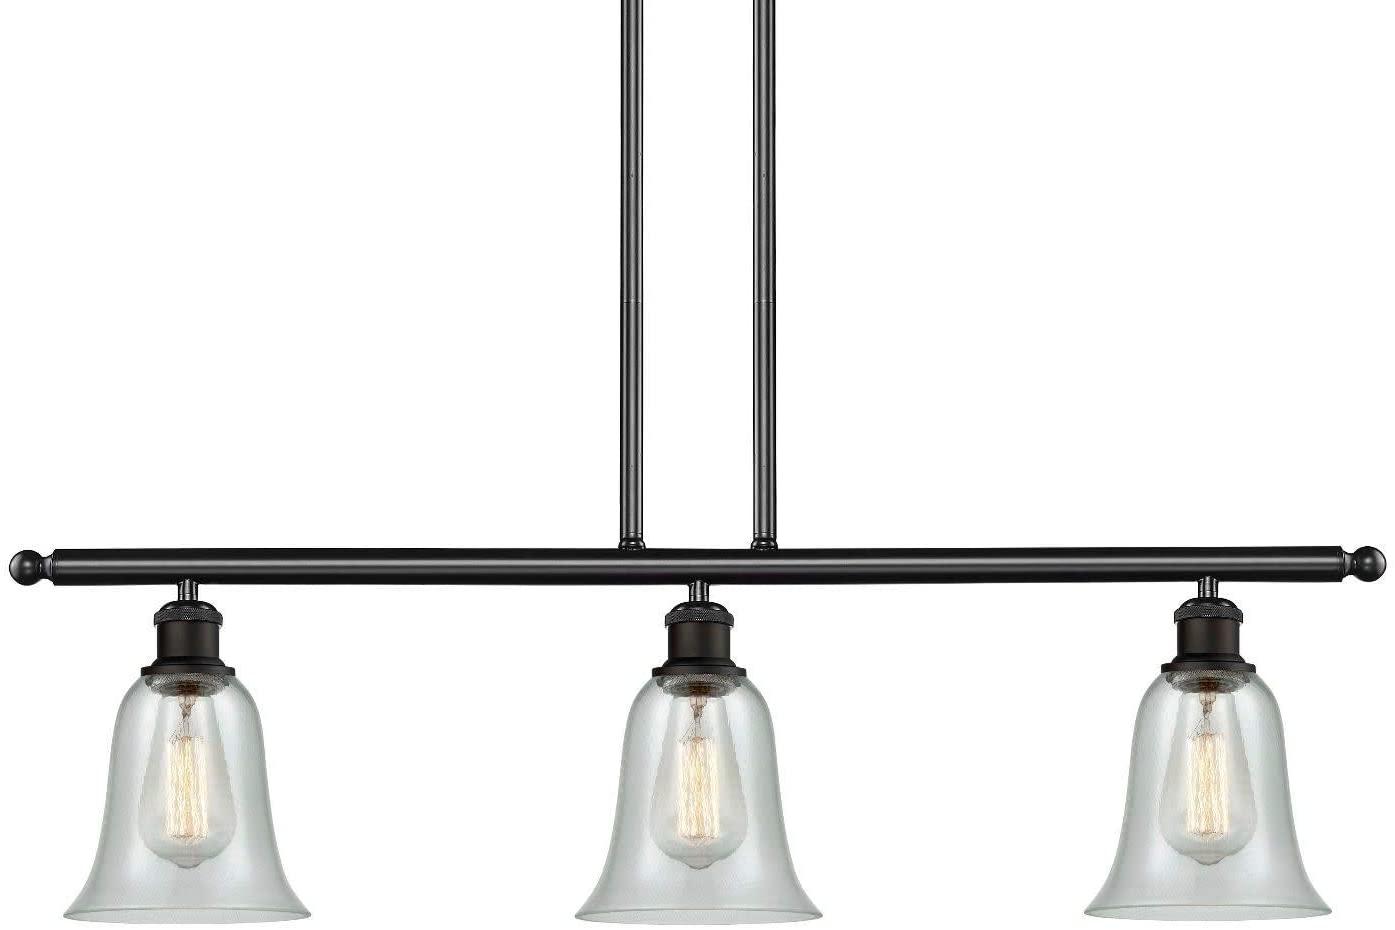 Innovations 516-3I-OB-G2812 3 Island Light, Oil Rubbed Bronze